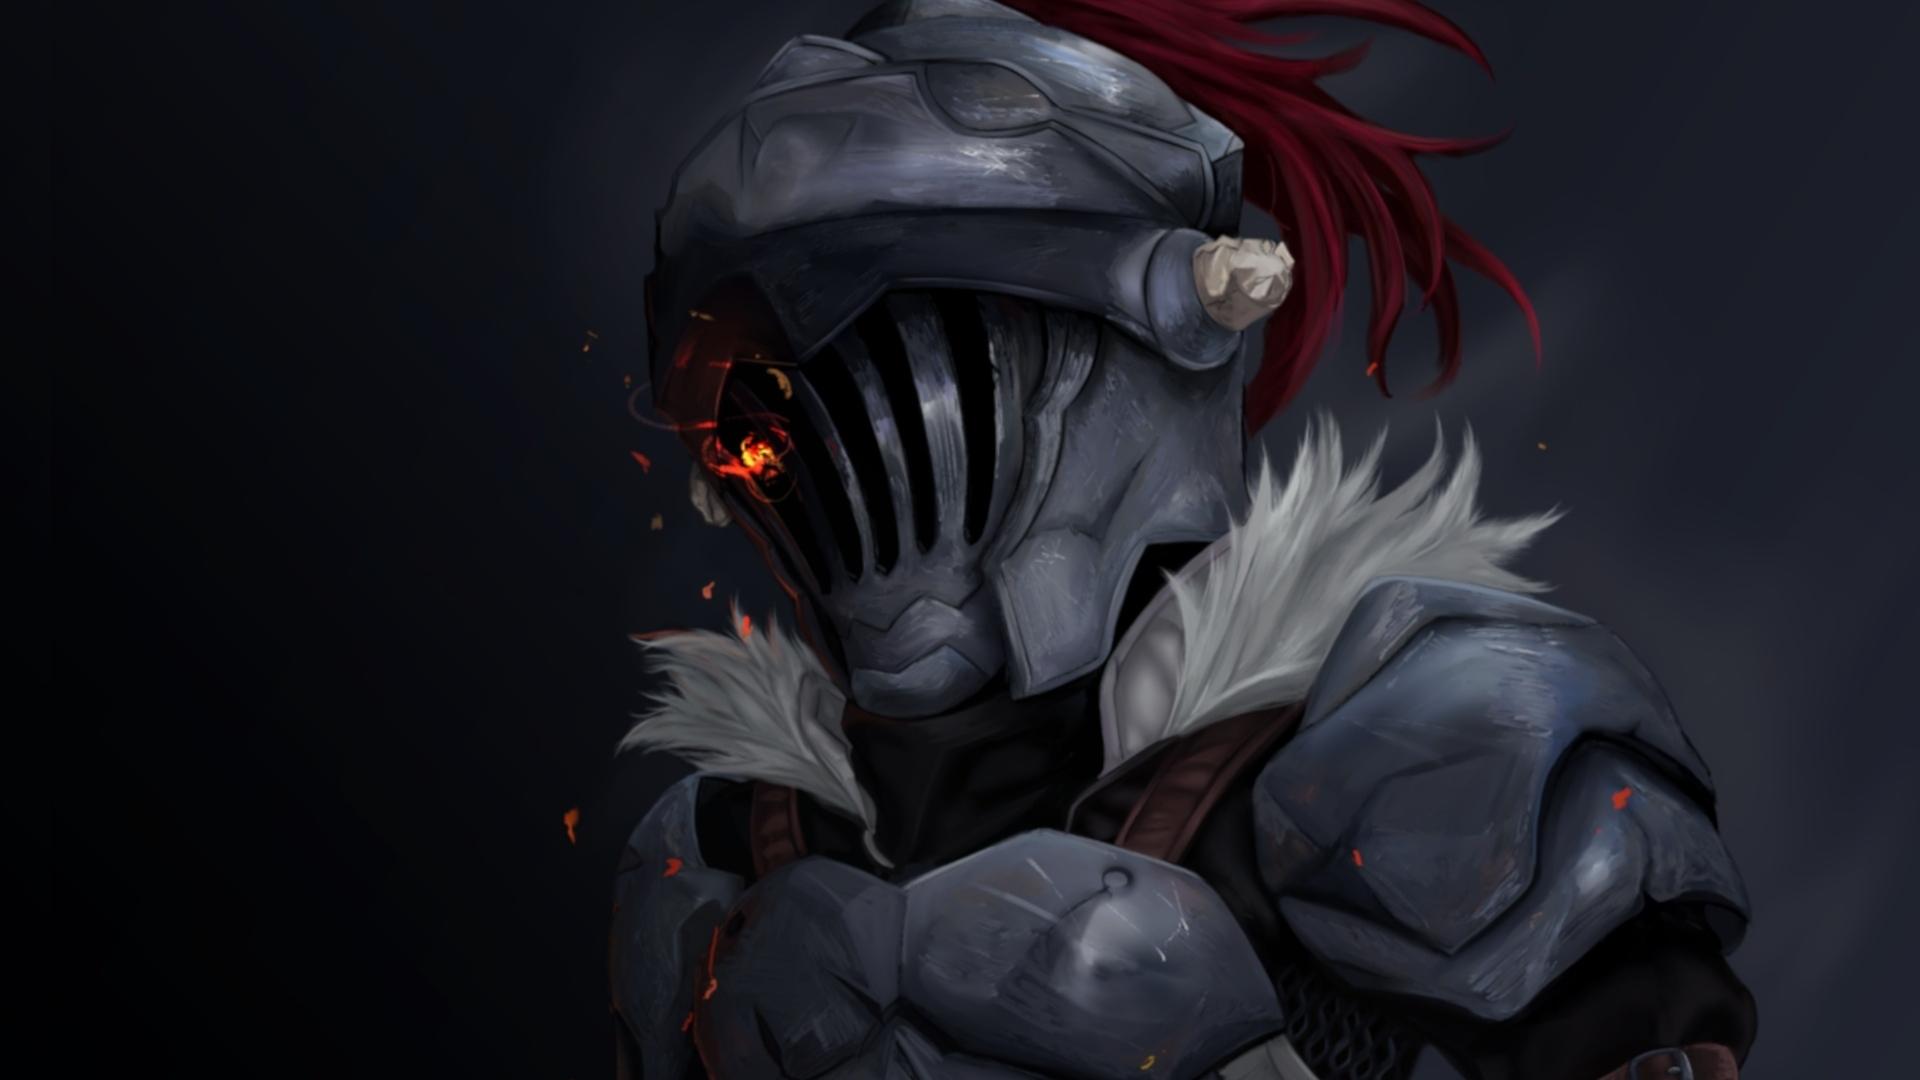 Download 1920x1080 wallpaper anime goblin slayer soldier armour full hd hdtv fhd 1080p - 1920x1080 hentai wallpaper ...